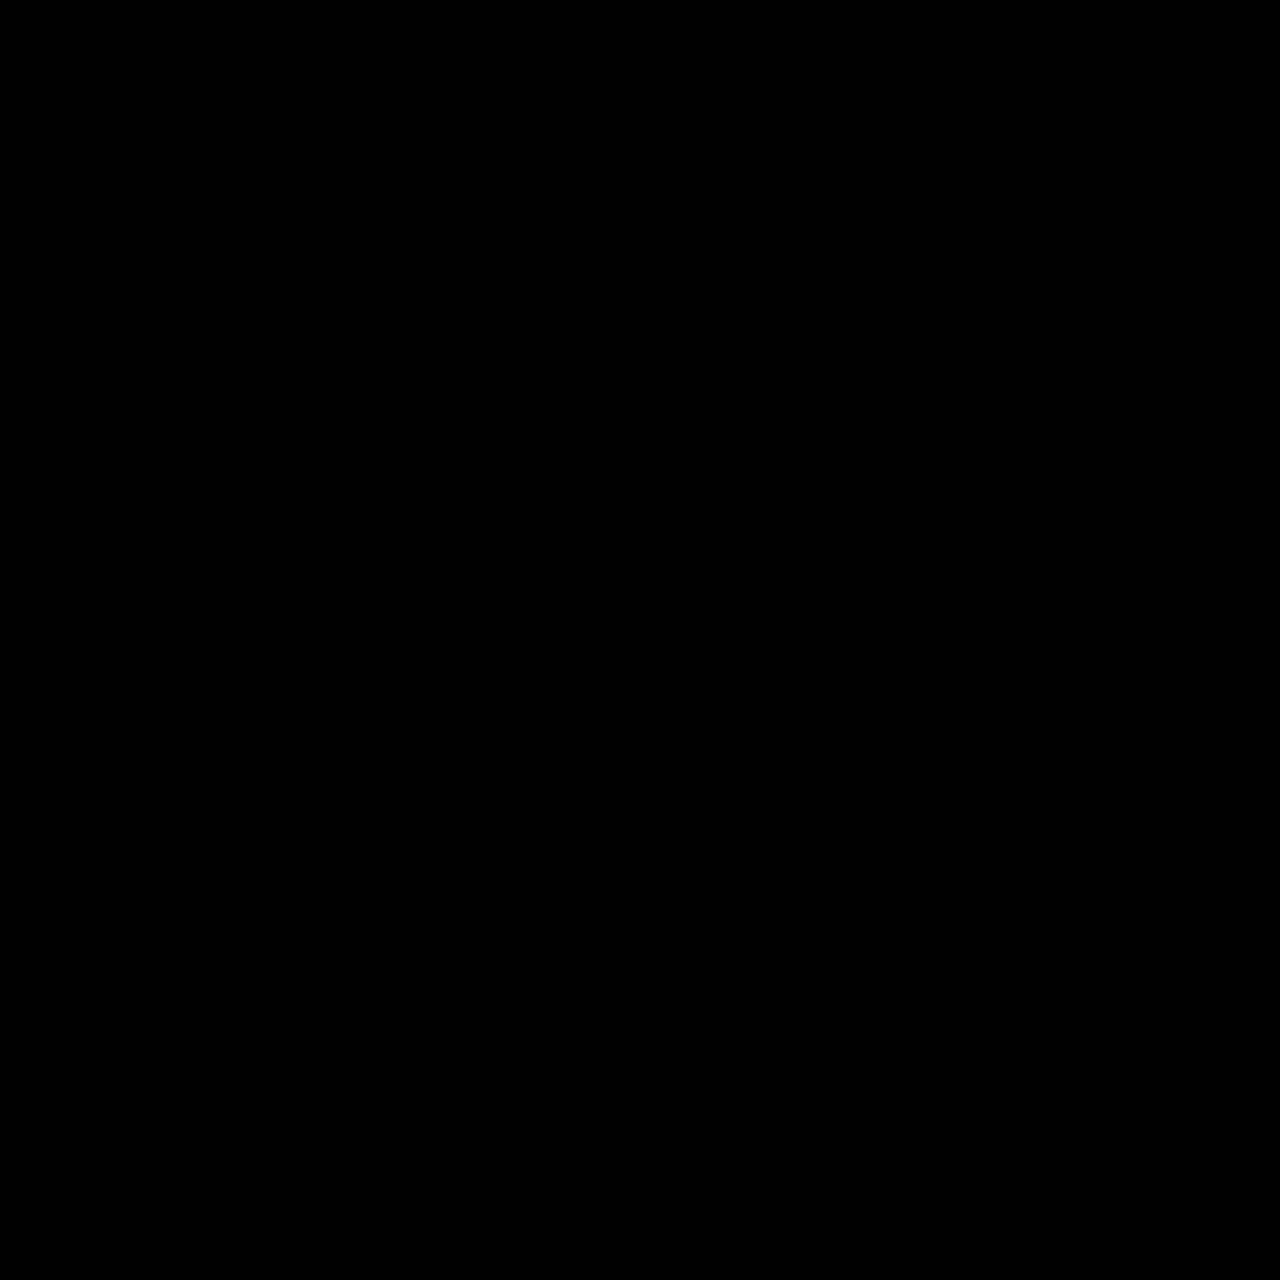 Chinesesigns Of The Zodiaczodiac Signastrologytiger Free Photo